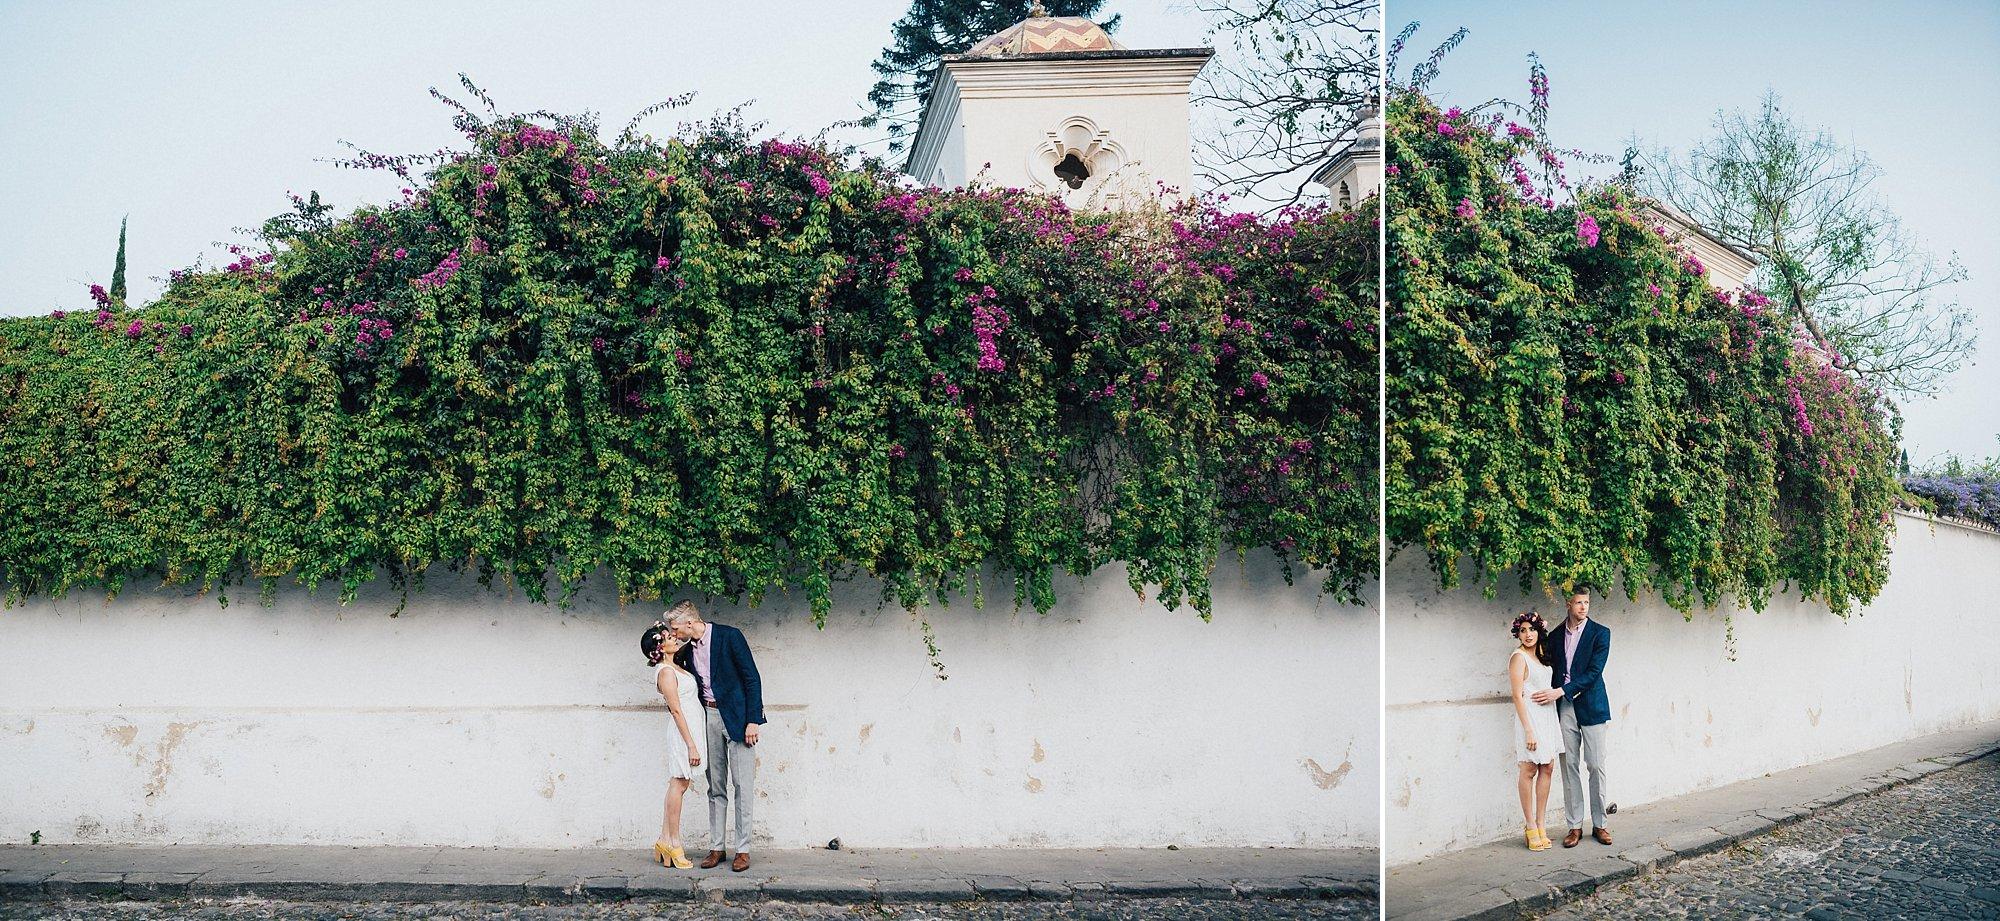 alex-yazmin-wedding-photographer-antigua-guatemala-027